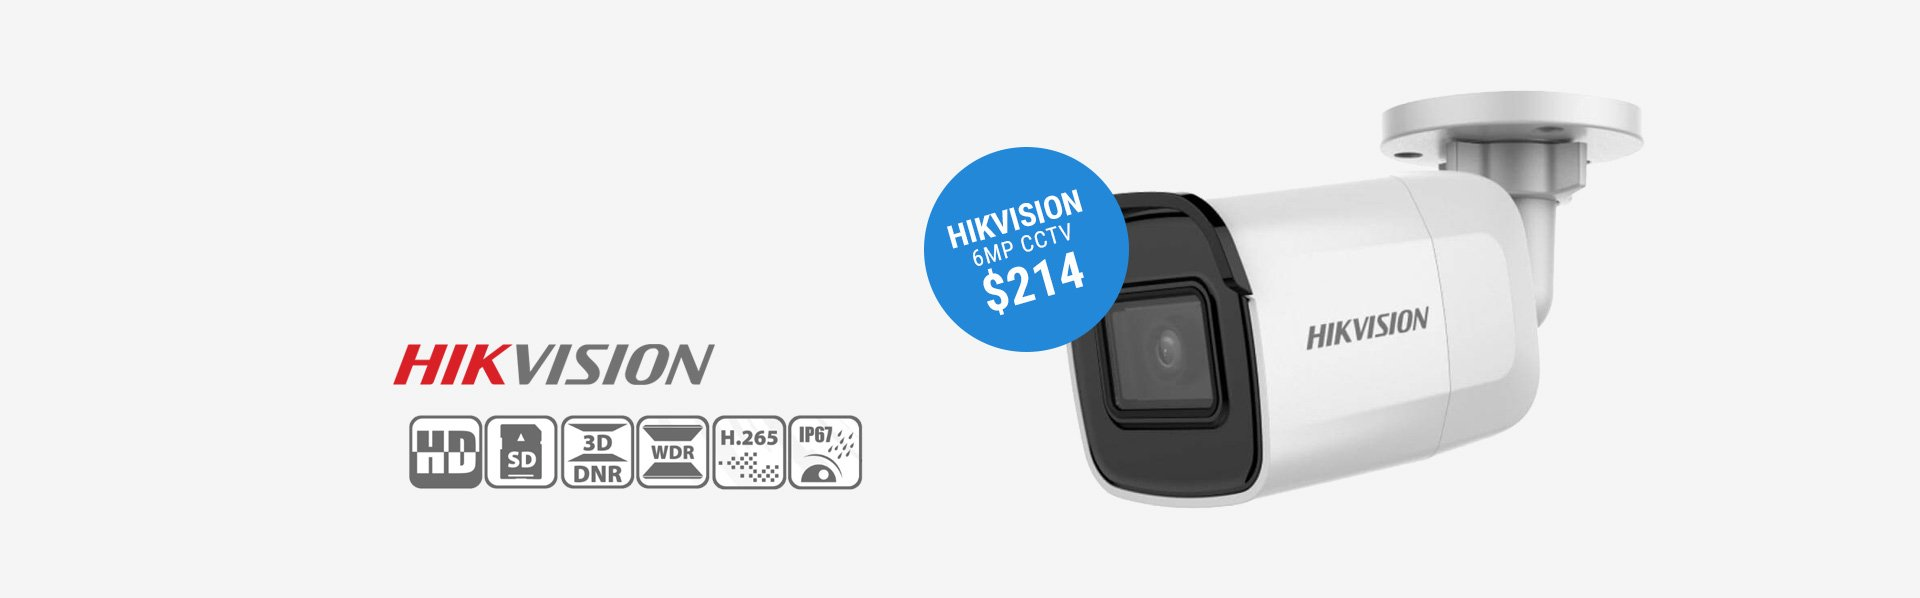 Hikvision 6MP CCTV